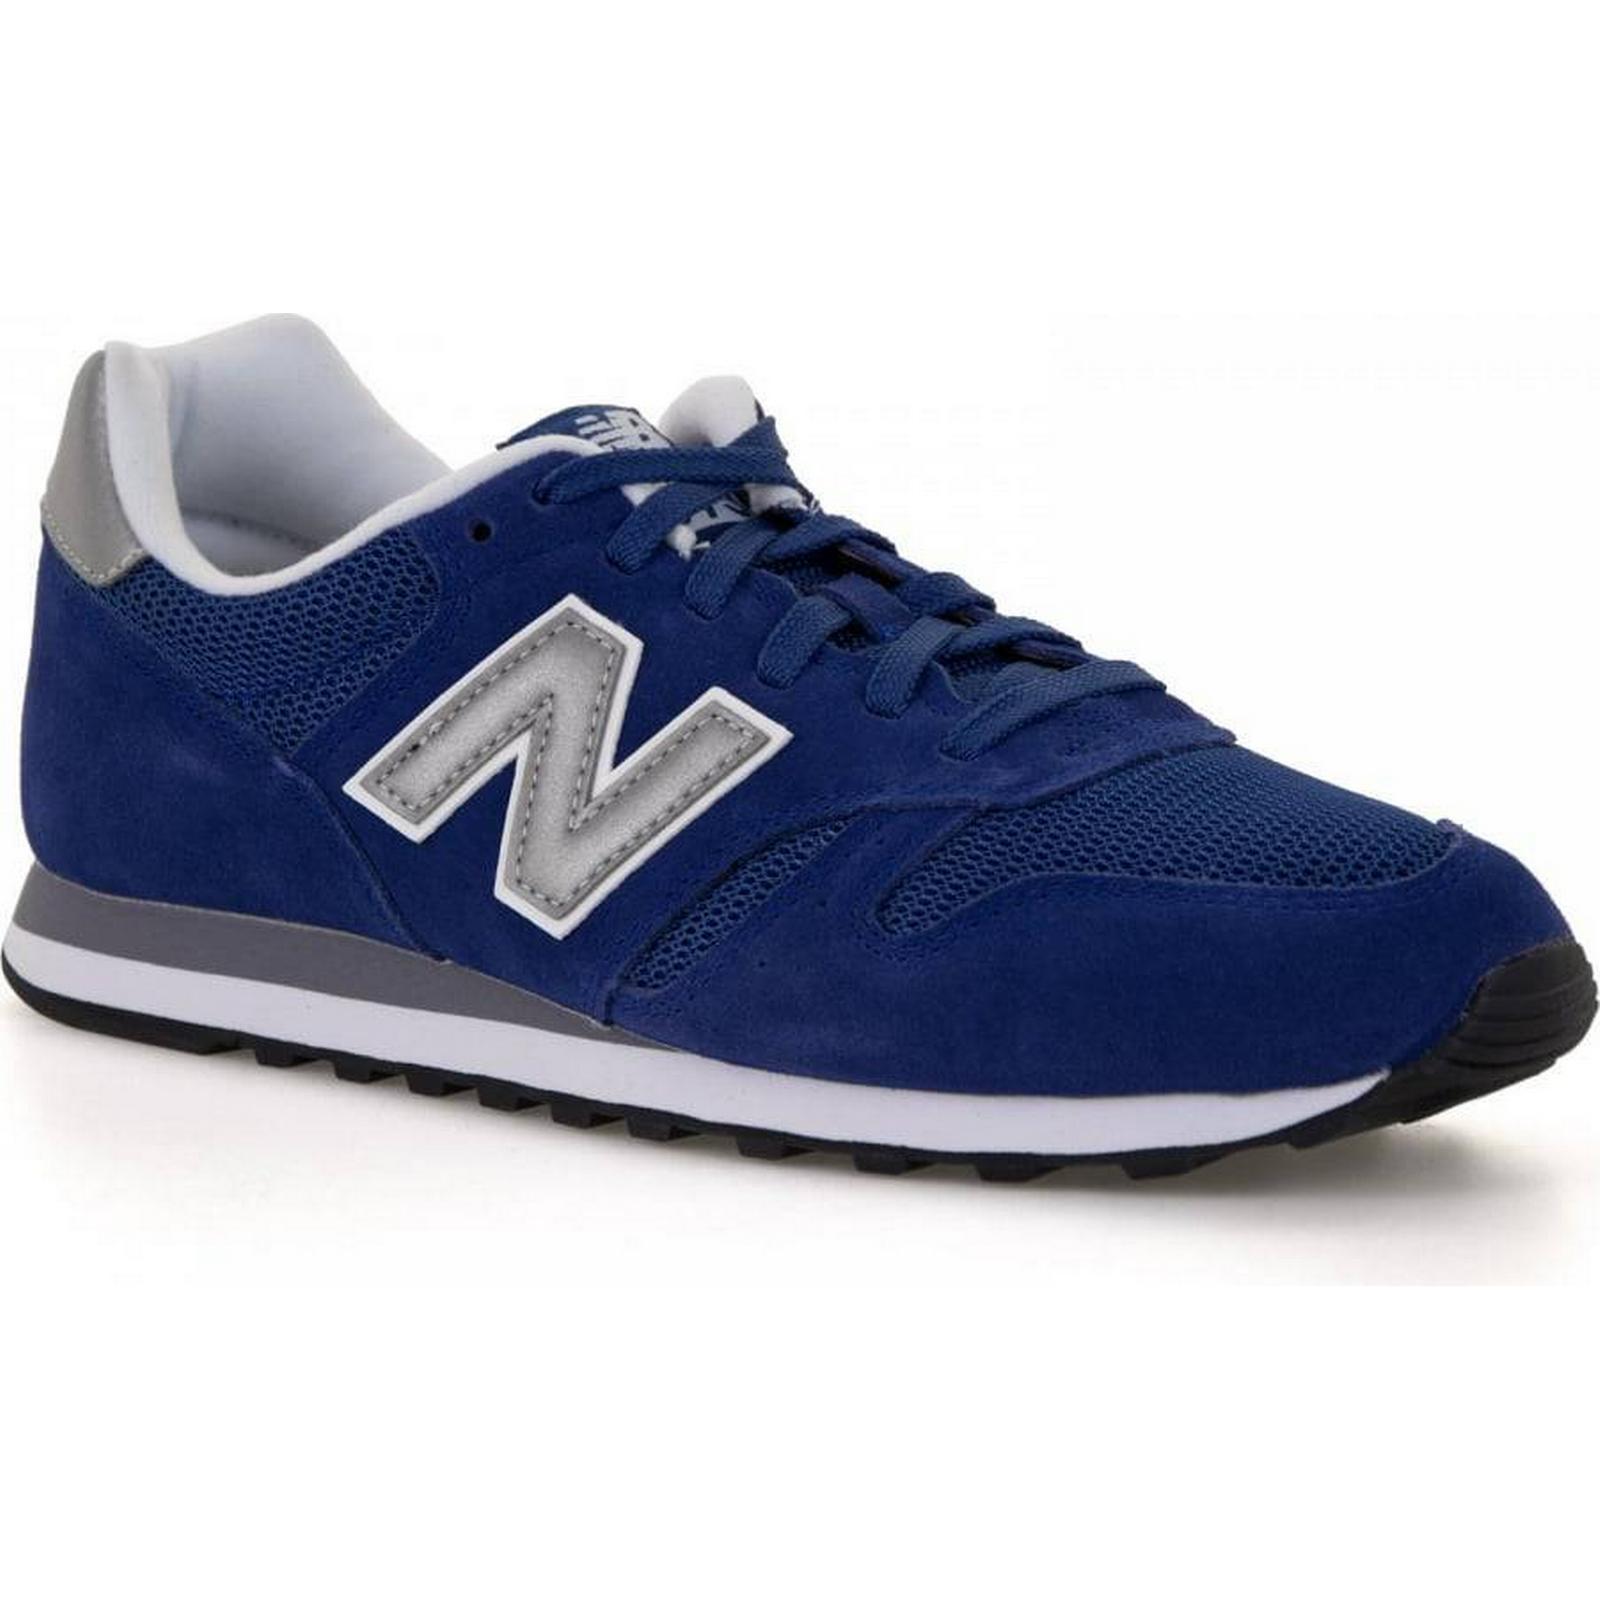 new balance 373 size 8